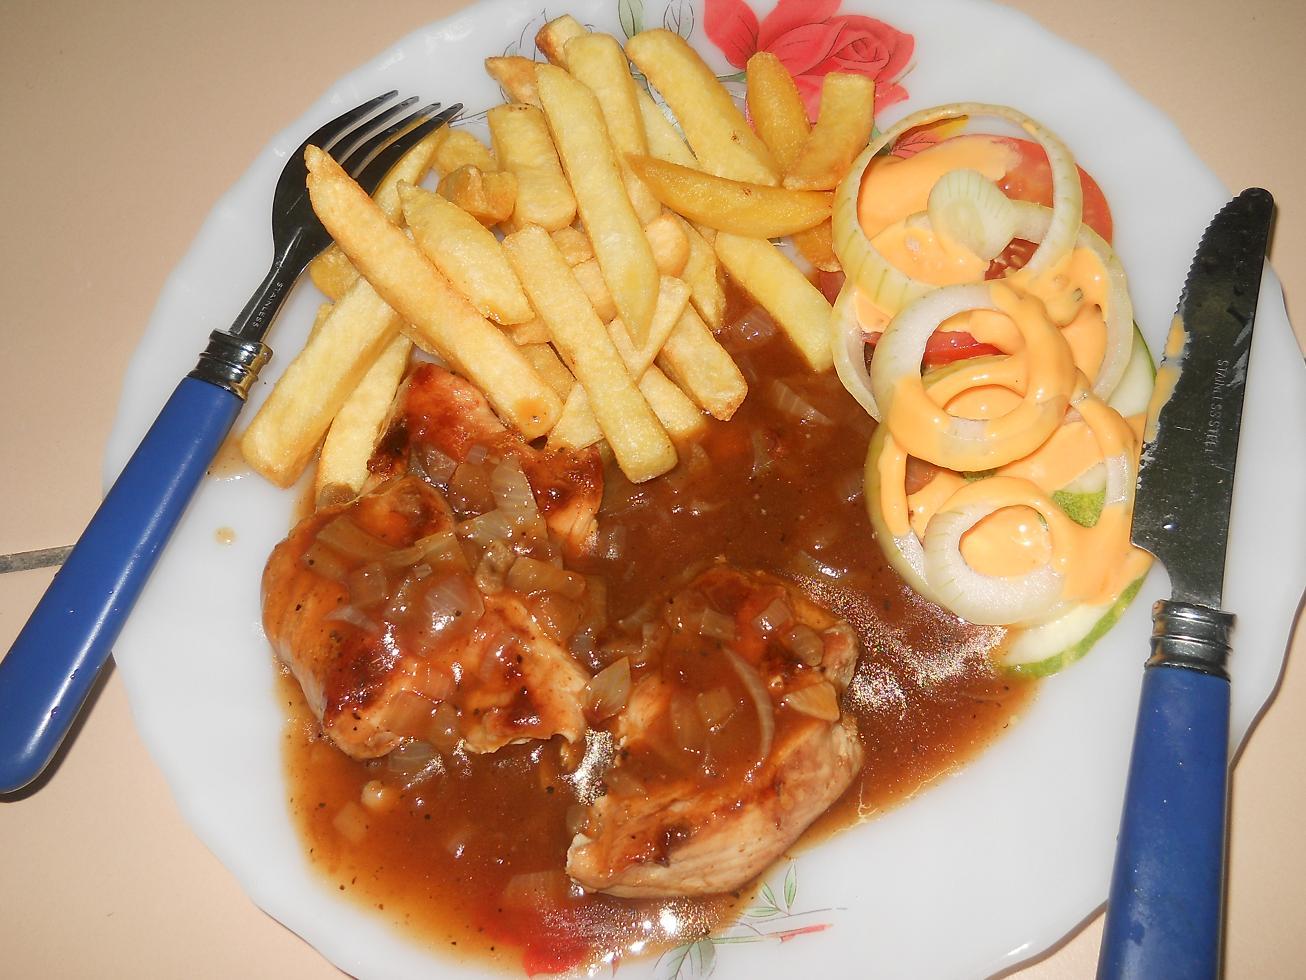 resepi ayam masak kentang kicap surasmi Resepi Mee Kicap Sheila Rusly Enak dan Mudah